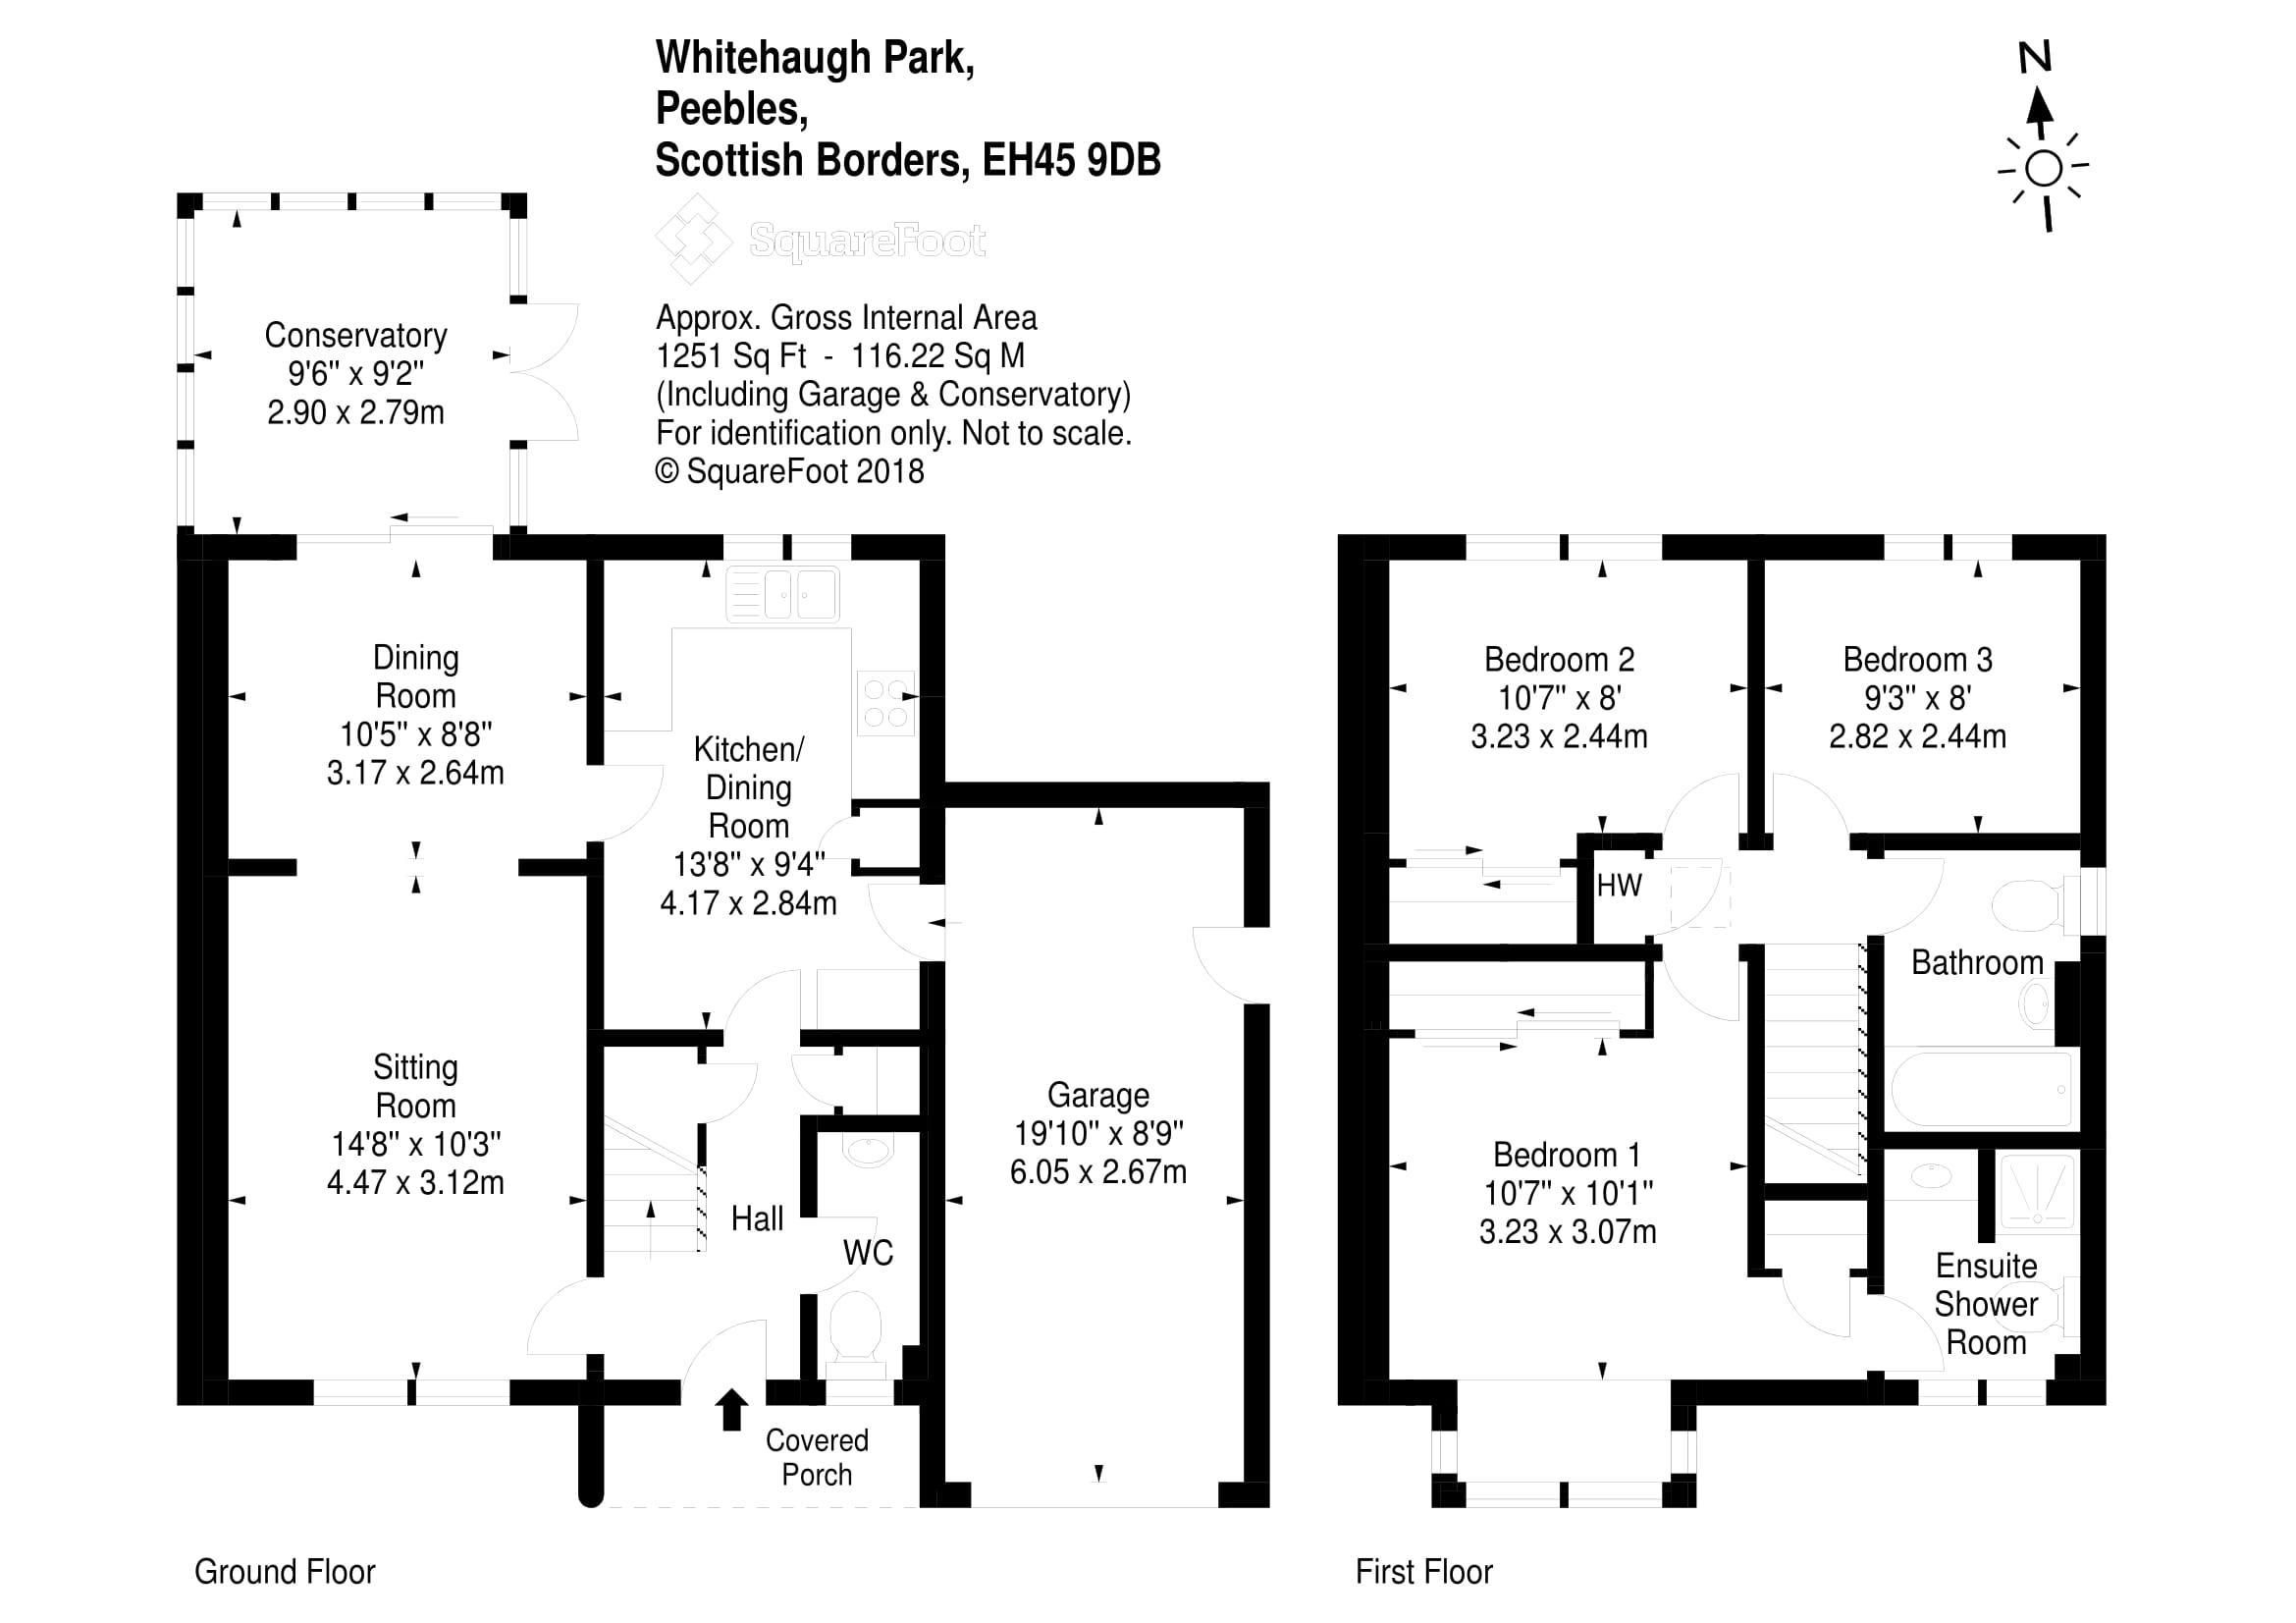 Whitehaugh Park